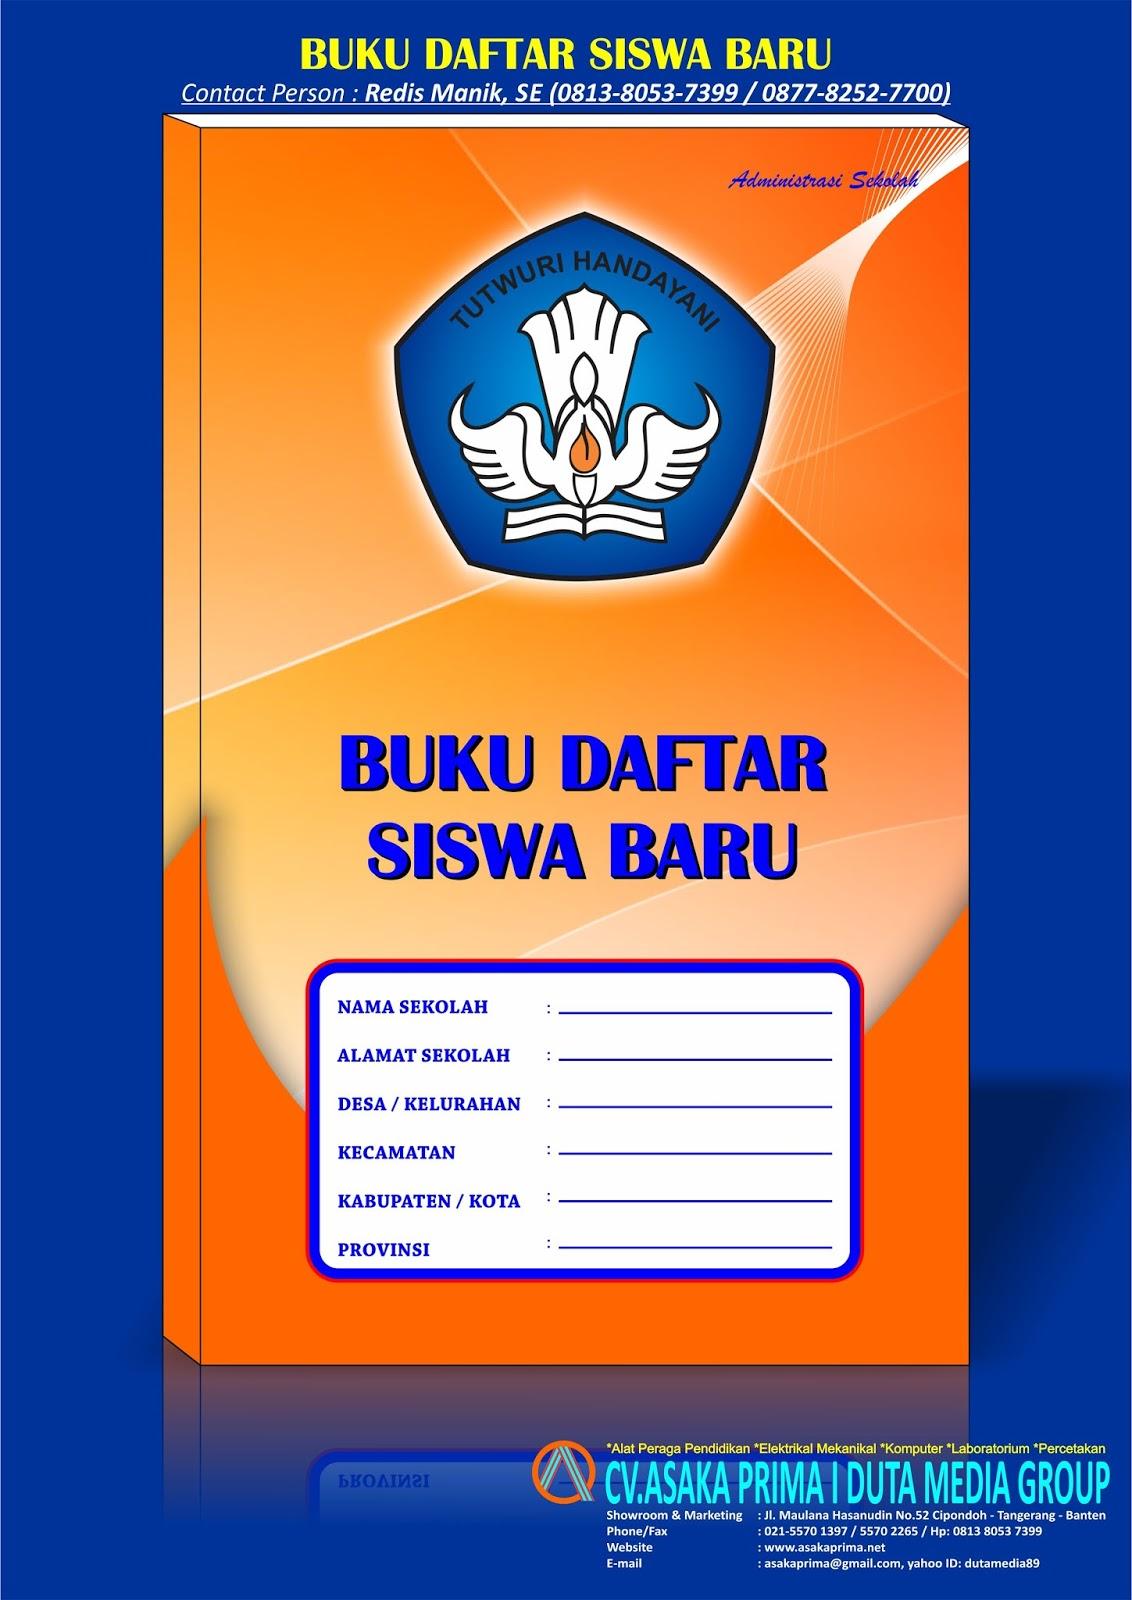 Daftar Harga Buku Administrasi Sekolah Paud Tk Sd Smp Sma Smk Tahun 2017 2018 Produsen Alat